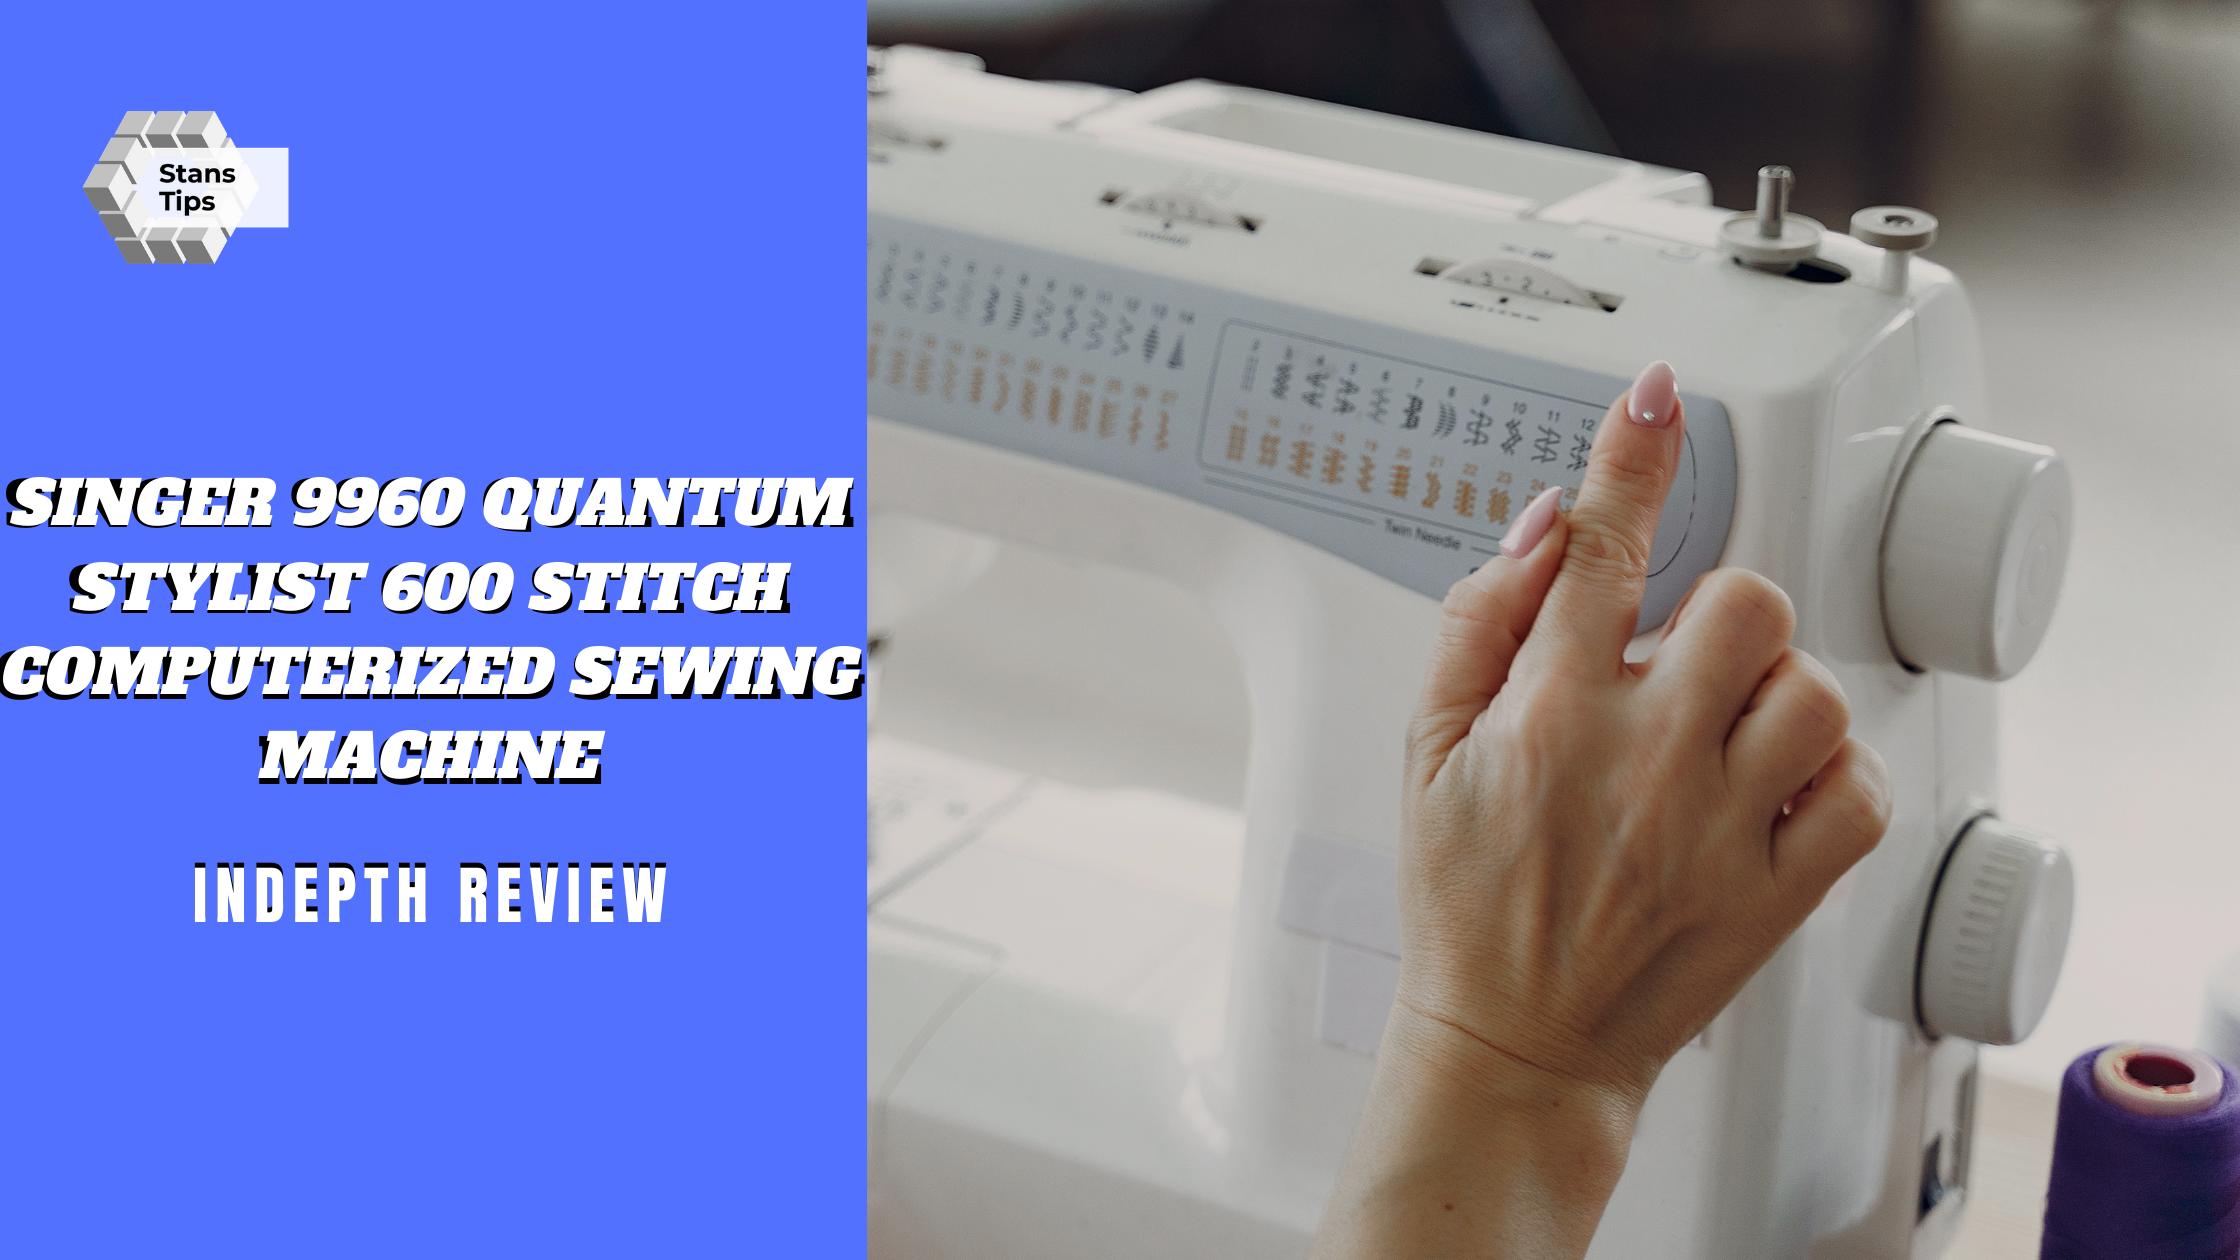 Singer 9960 quantum stylist 600 stitch computerized sewing machine